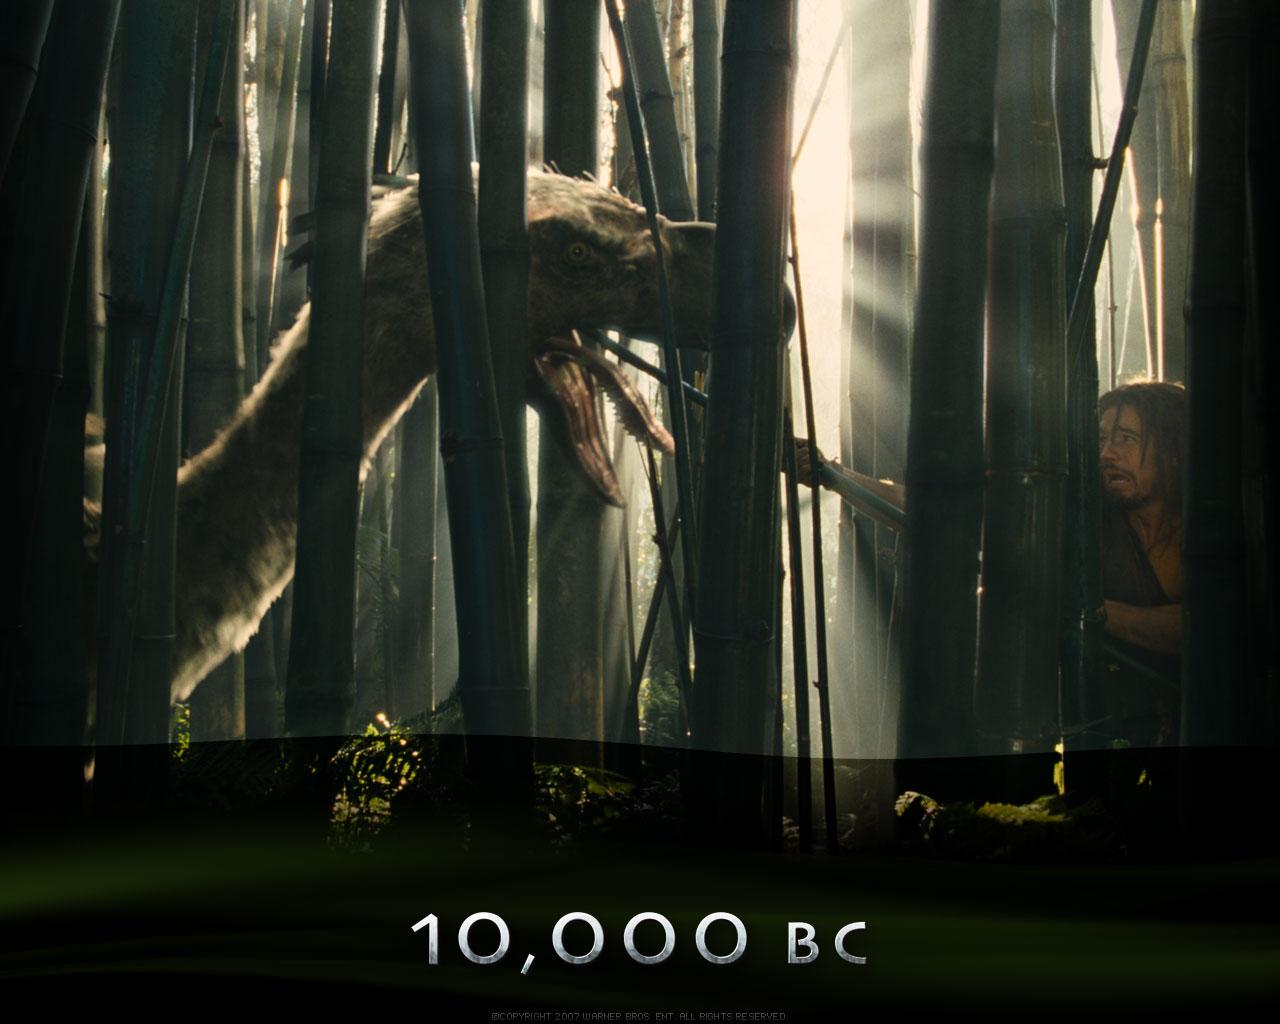 https://i0.wp.com/images.fanpop.com/images/image_uploads/10-000-B-C--upcoming-movies-680828_1280_1024.jpg